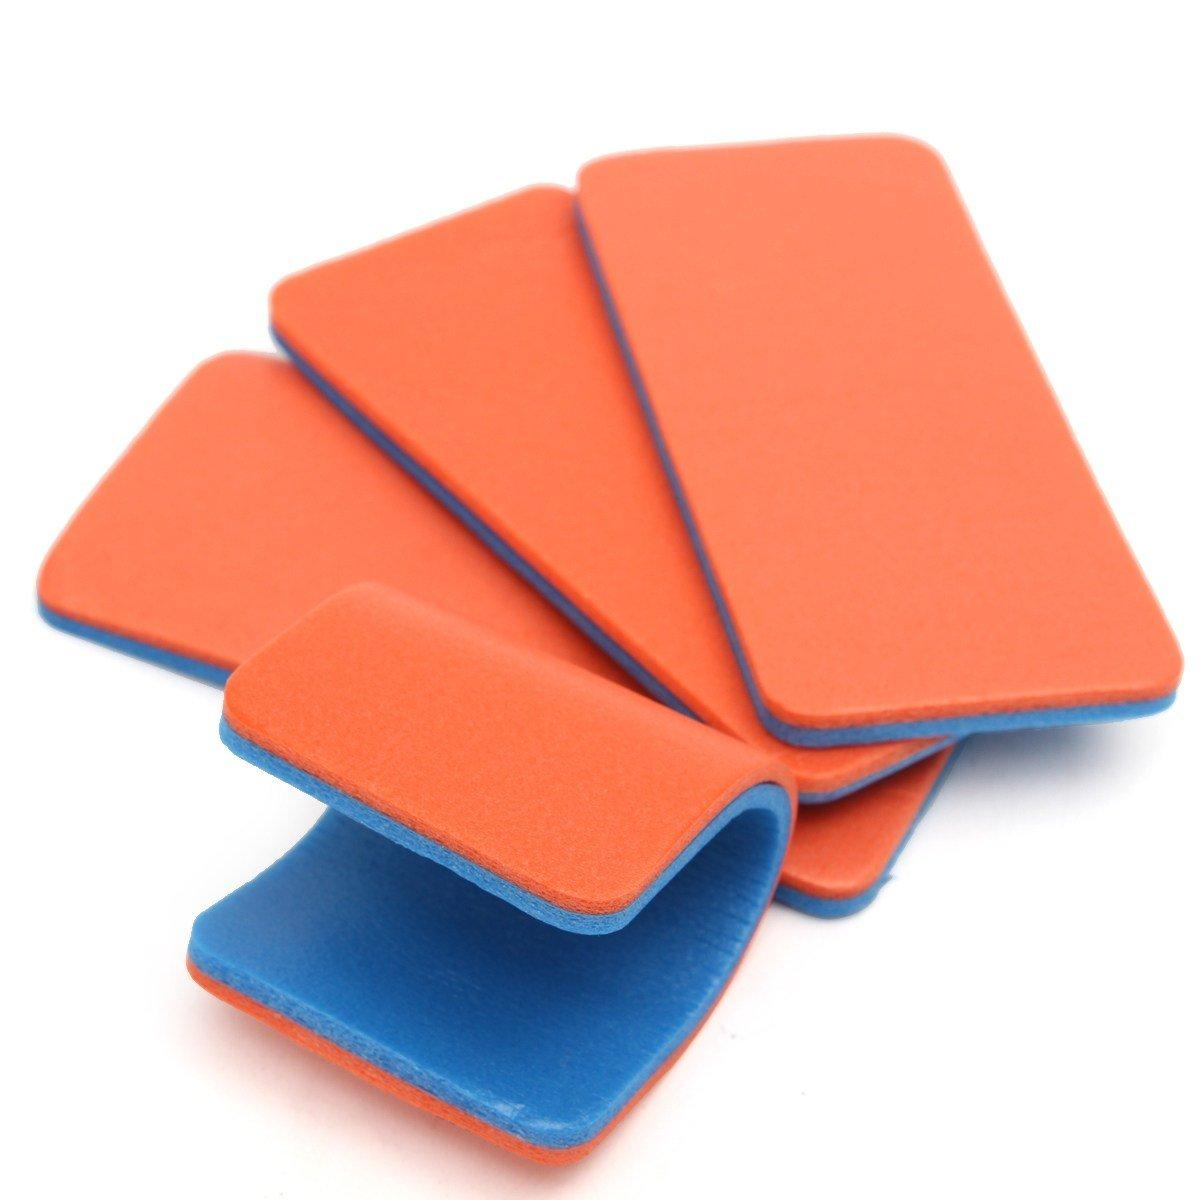 WowObjects 4Pcs Safurance Finger Splint Aluminum Medical Polymer Sam  orthopaedics Emergency Treatment Kits: Amazon.in: Home & Kitchen